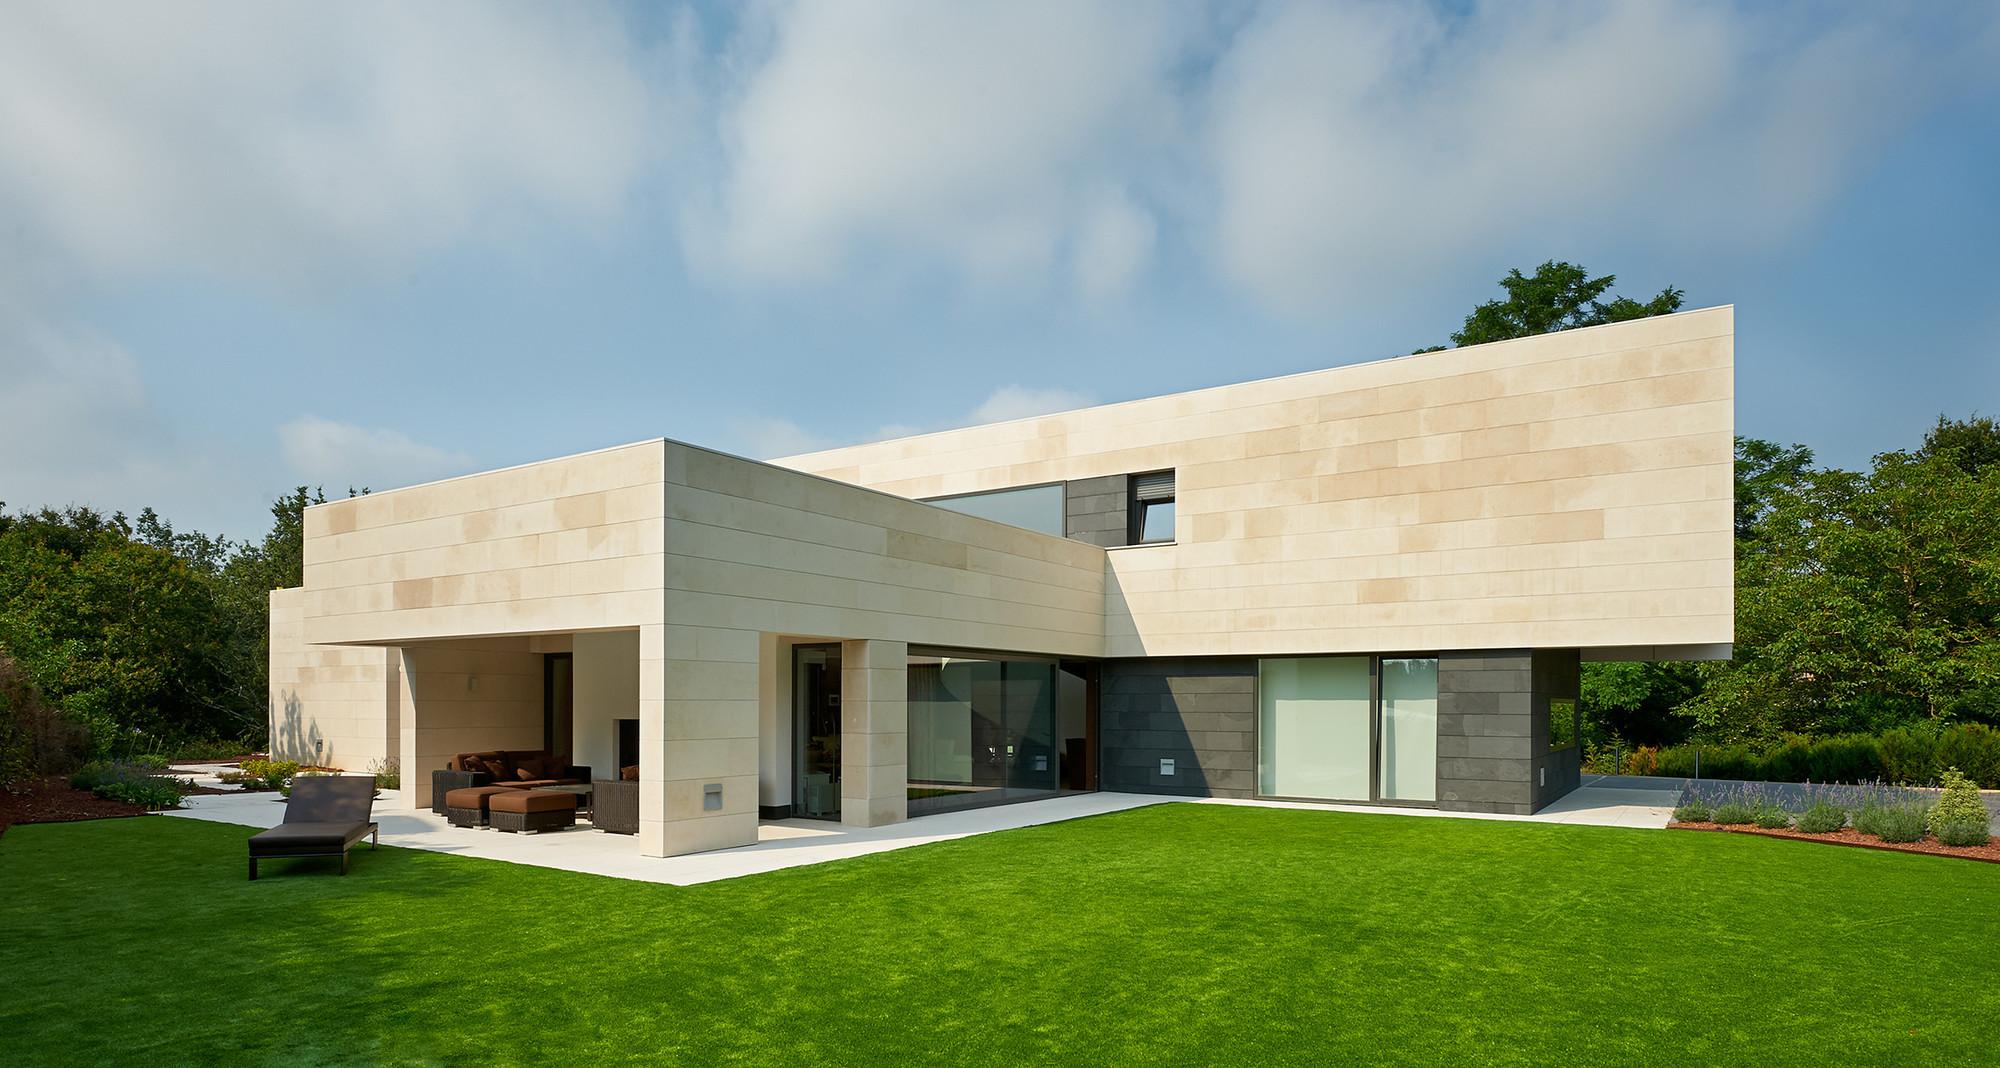 Casa en la bilban a foraster arquitectos archdaily - Idea casa biancheria mestre ...